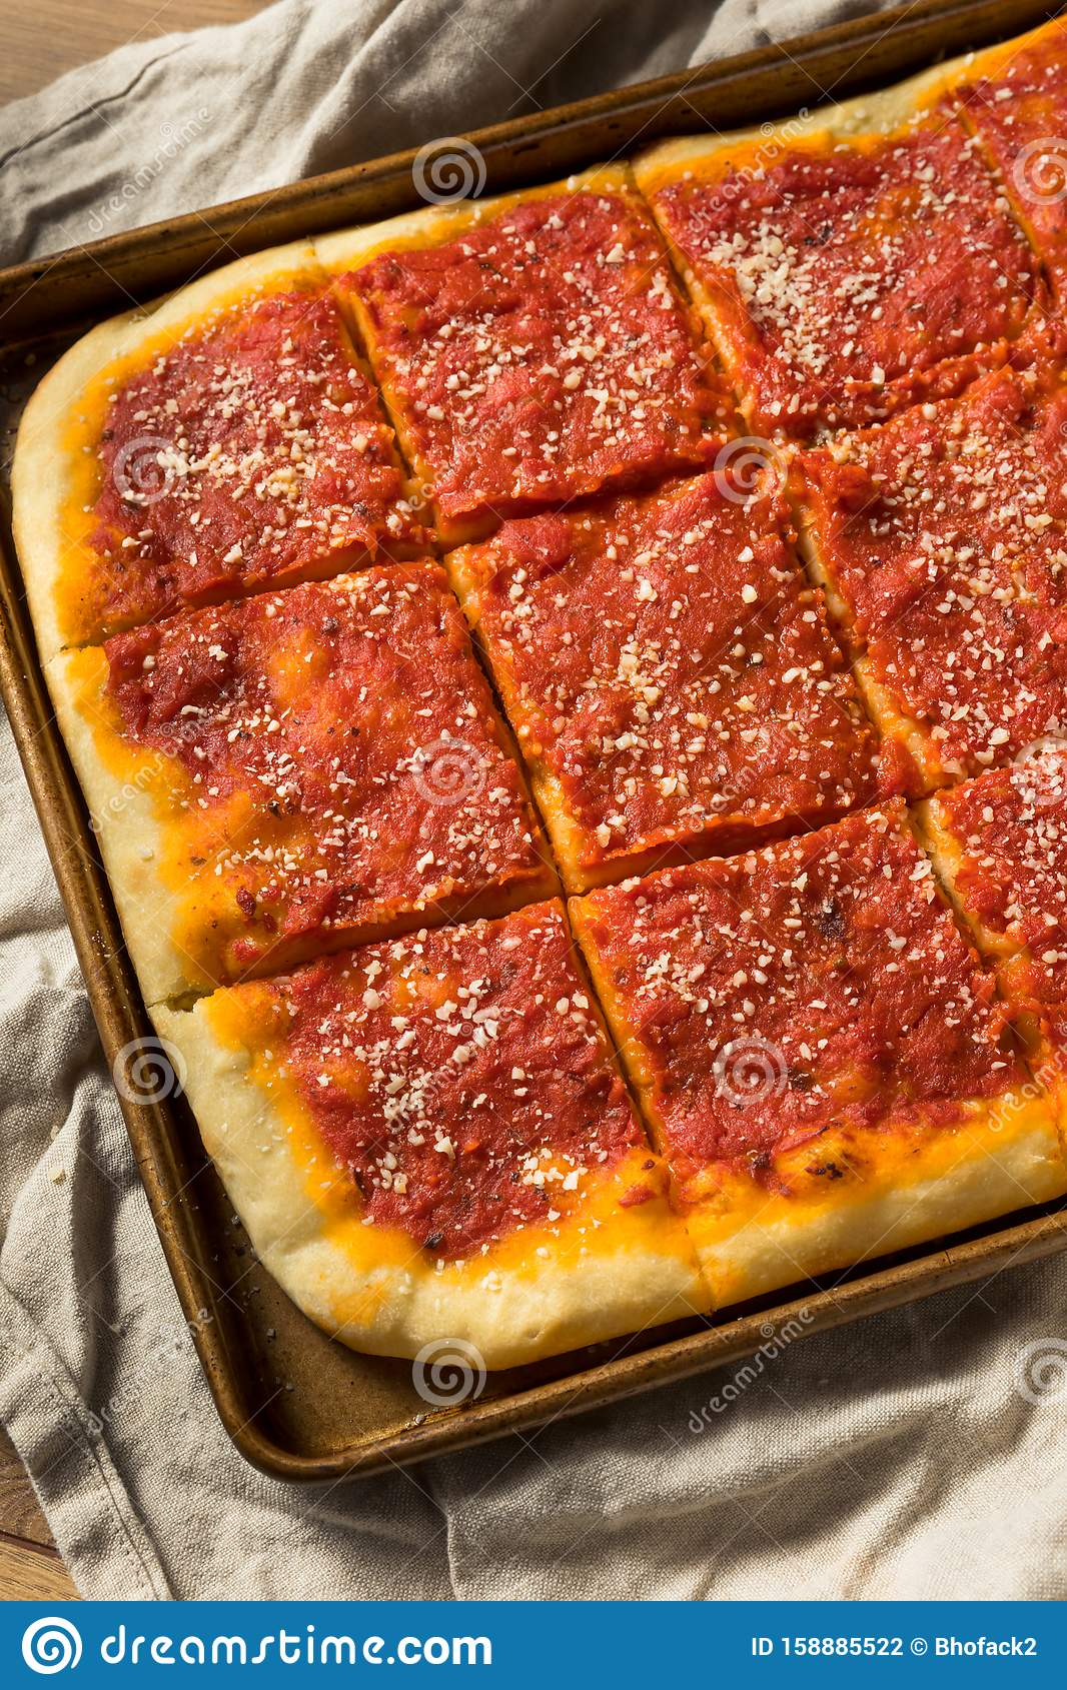 Homemade Philadelphia Tomato Pie Stock Photo Image Of Dinner Sauce 158885522